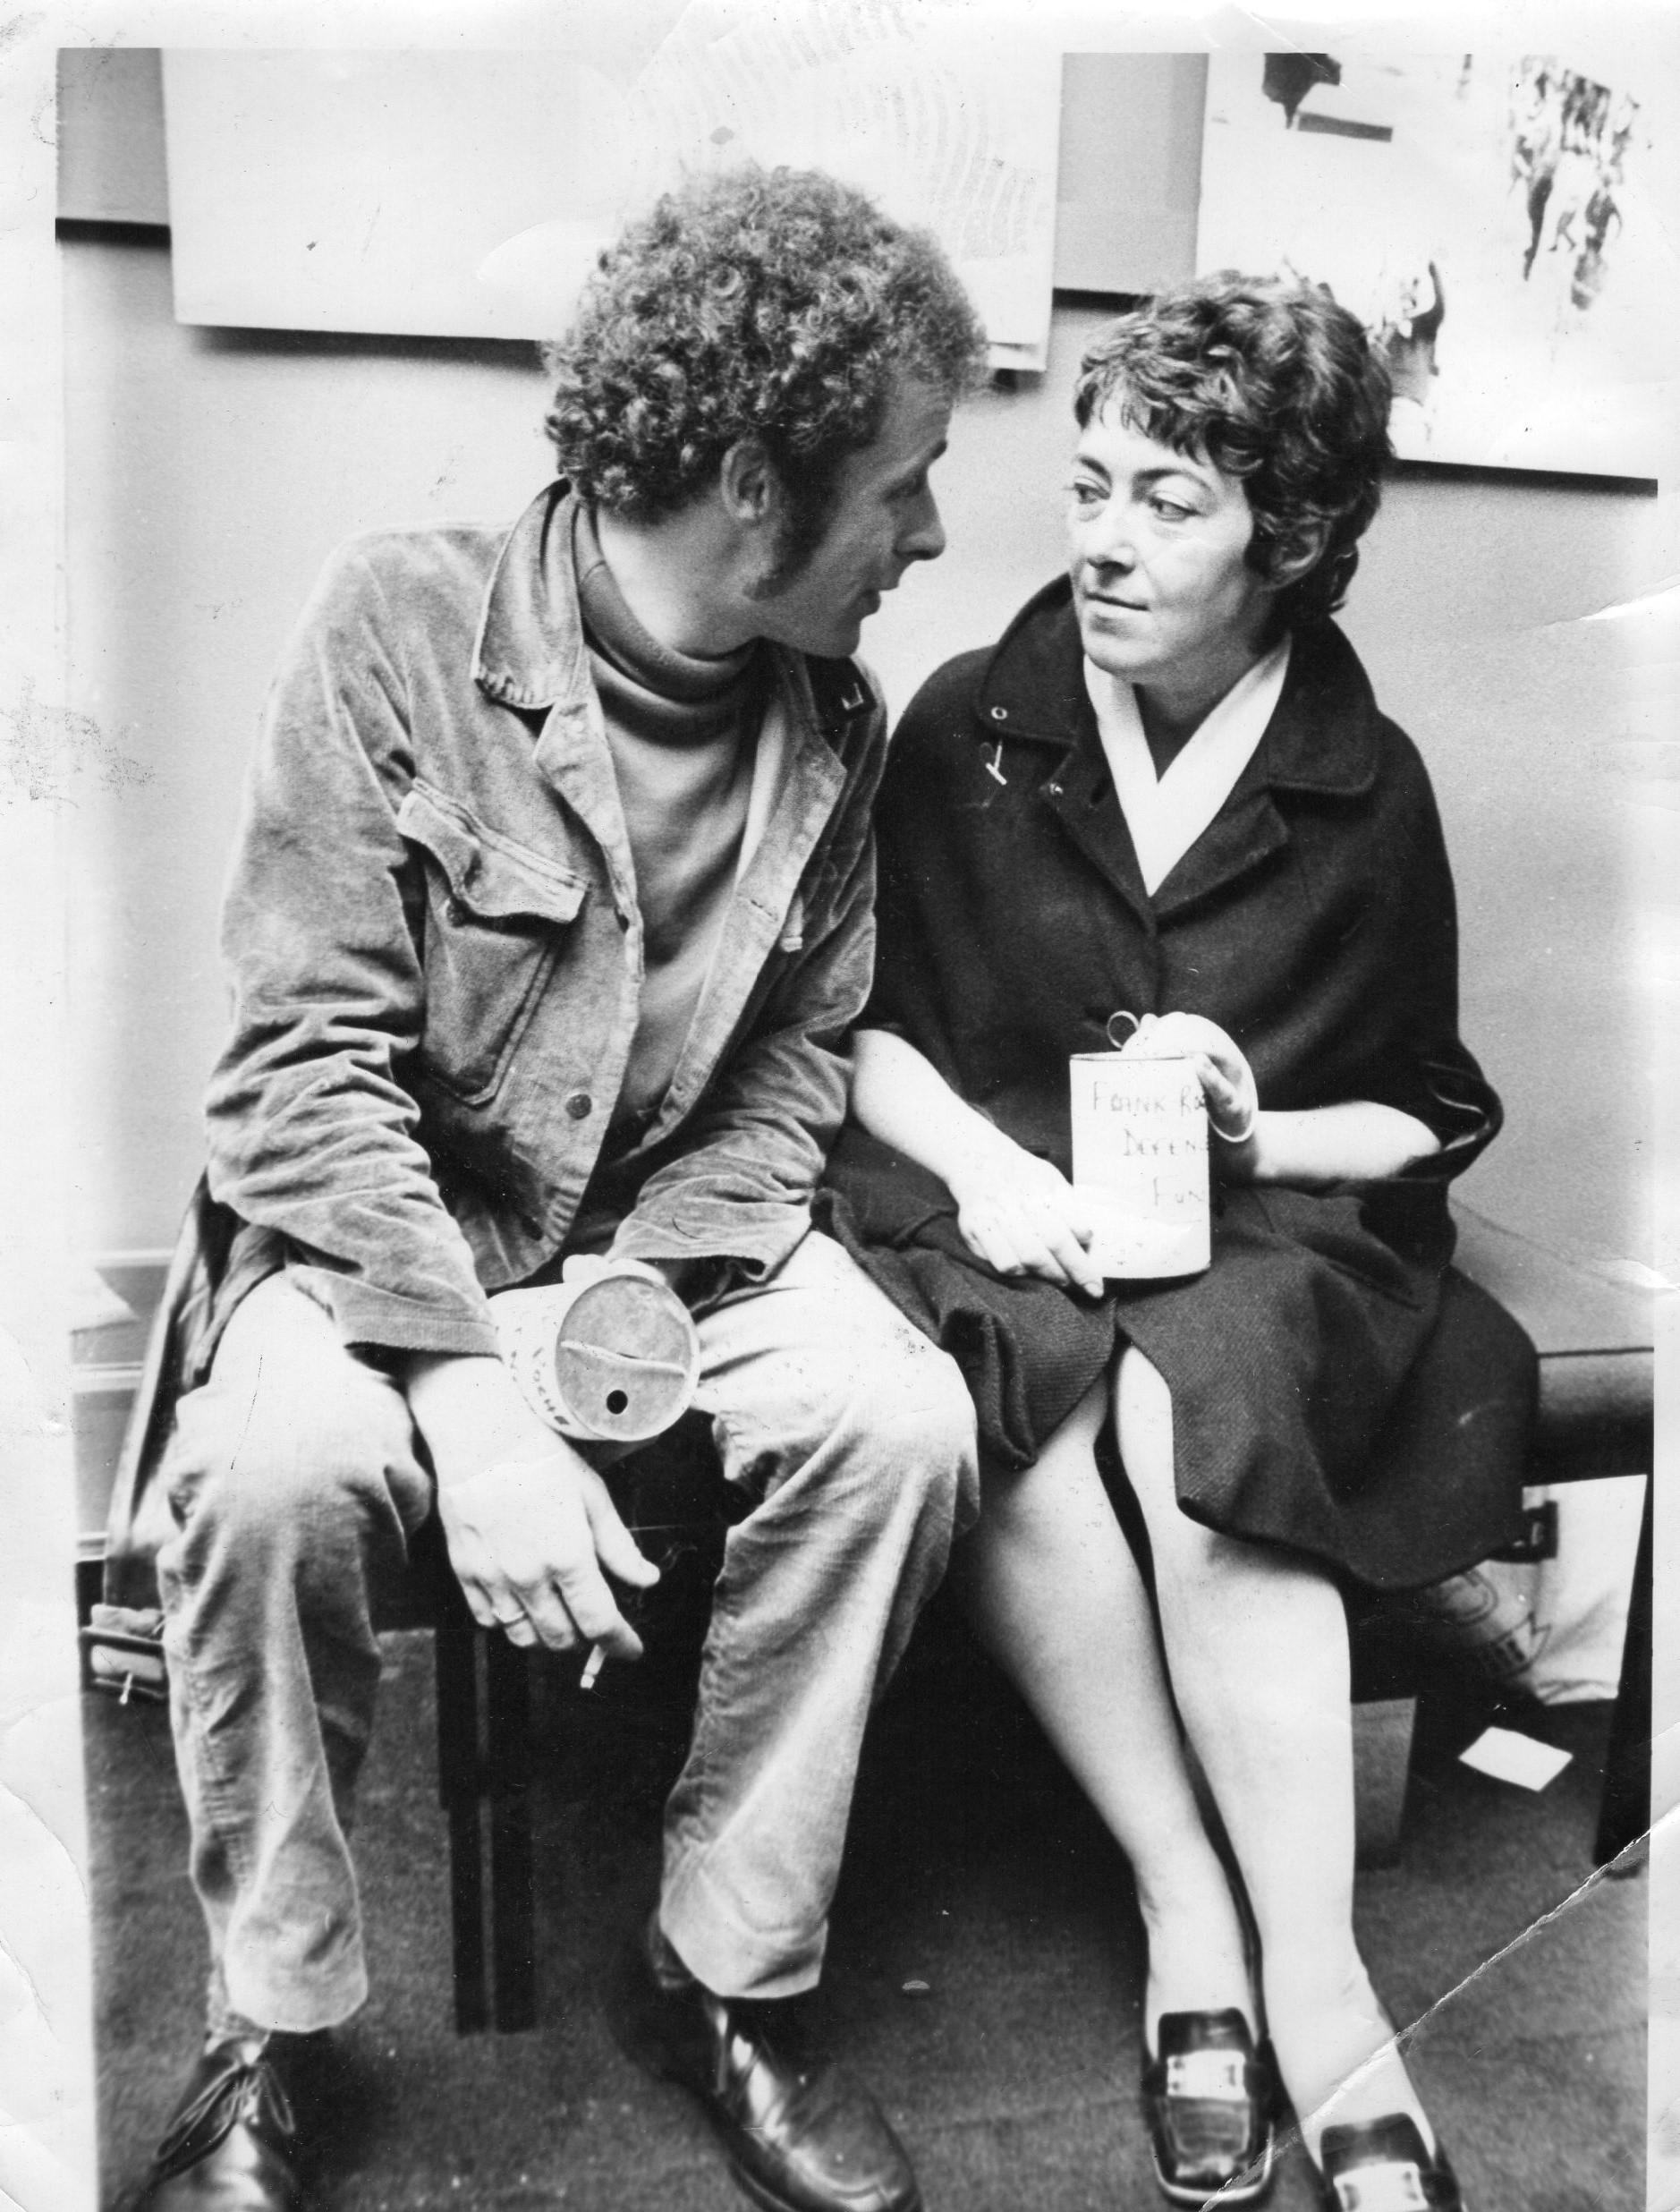 Bernadette devlin mcaliskey the irish revolution mairin keegan and mccann 1970 malvernweather Gallery